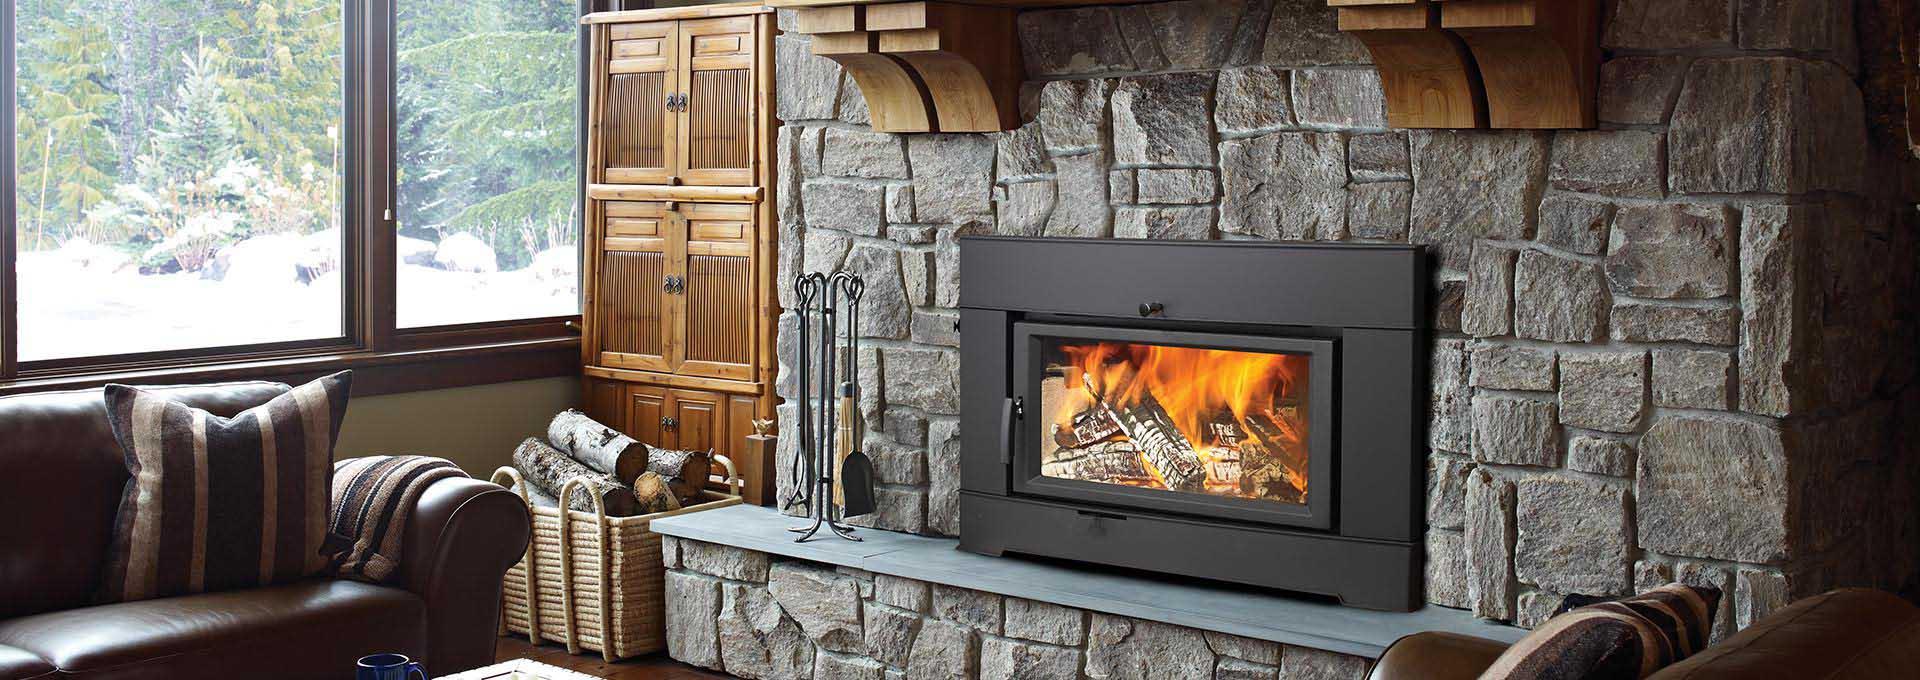 High Efficiency Wood Insert Pro Series Ci2700 Regency